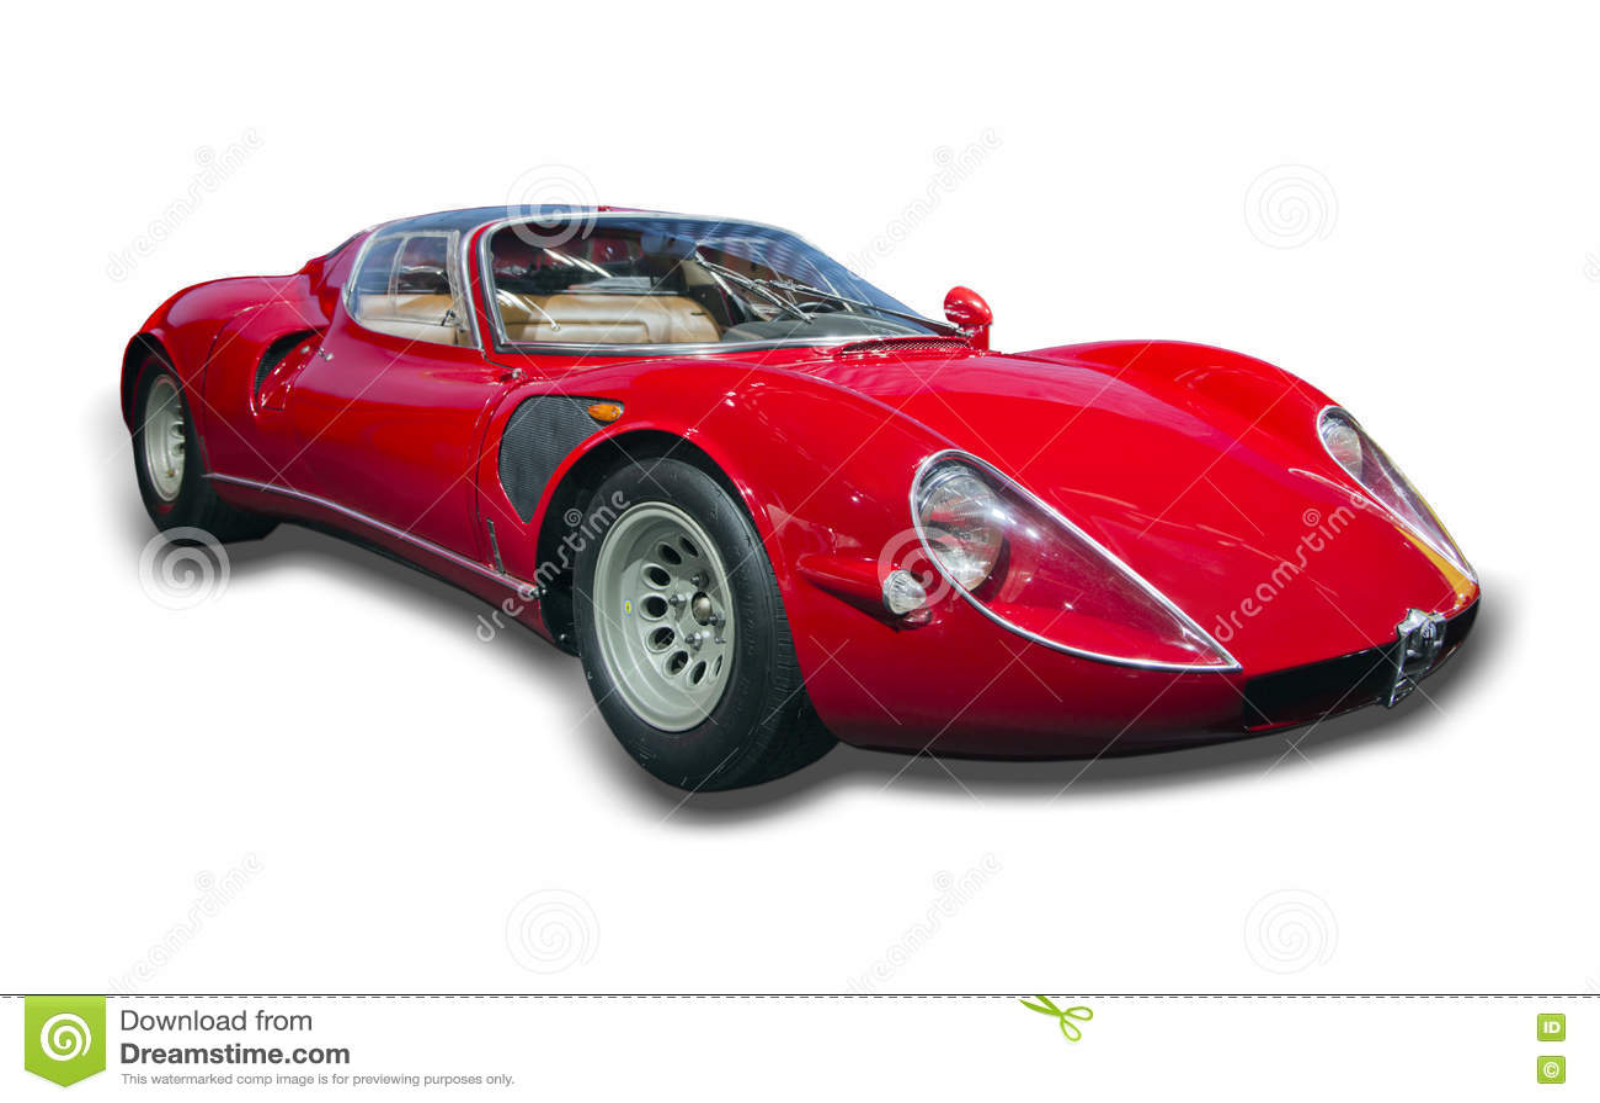 автомобиль 1968 33 спорт Romeo альфы Stradale